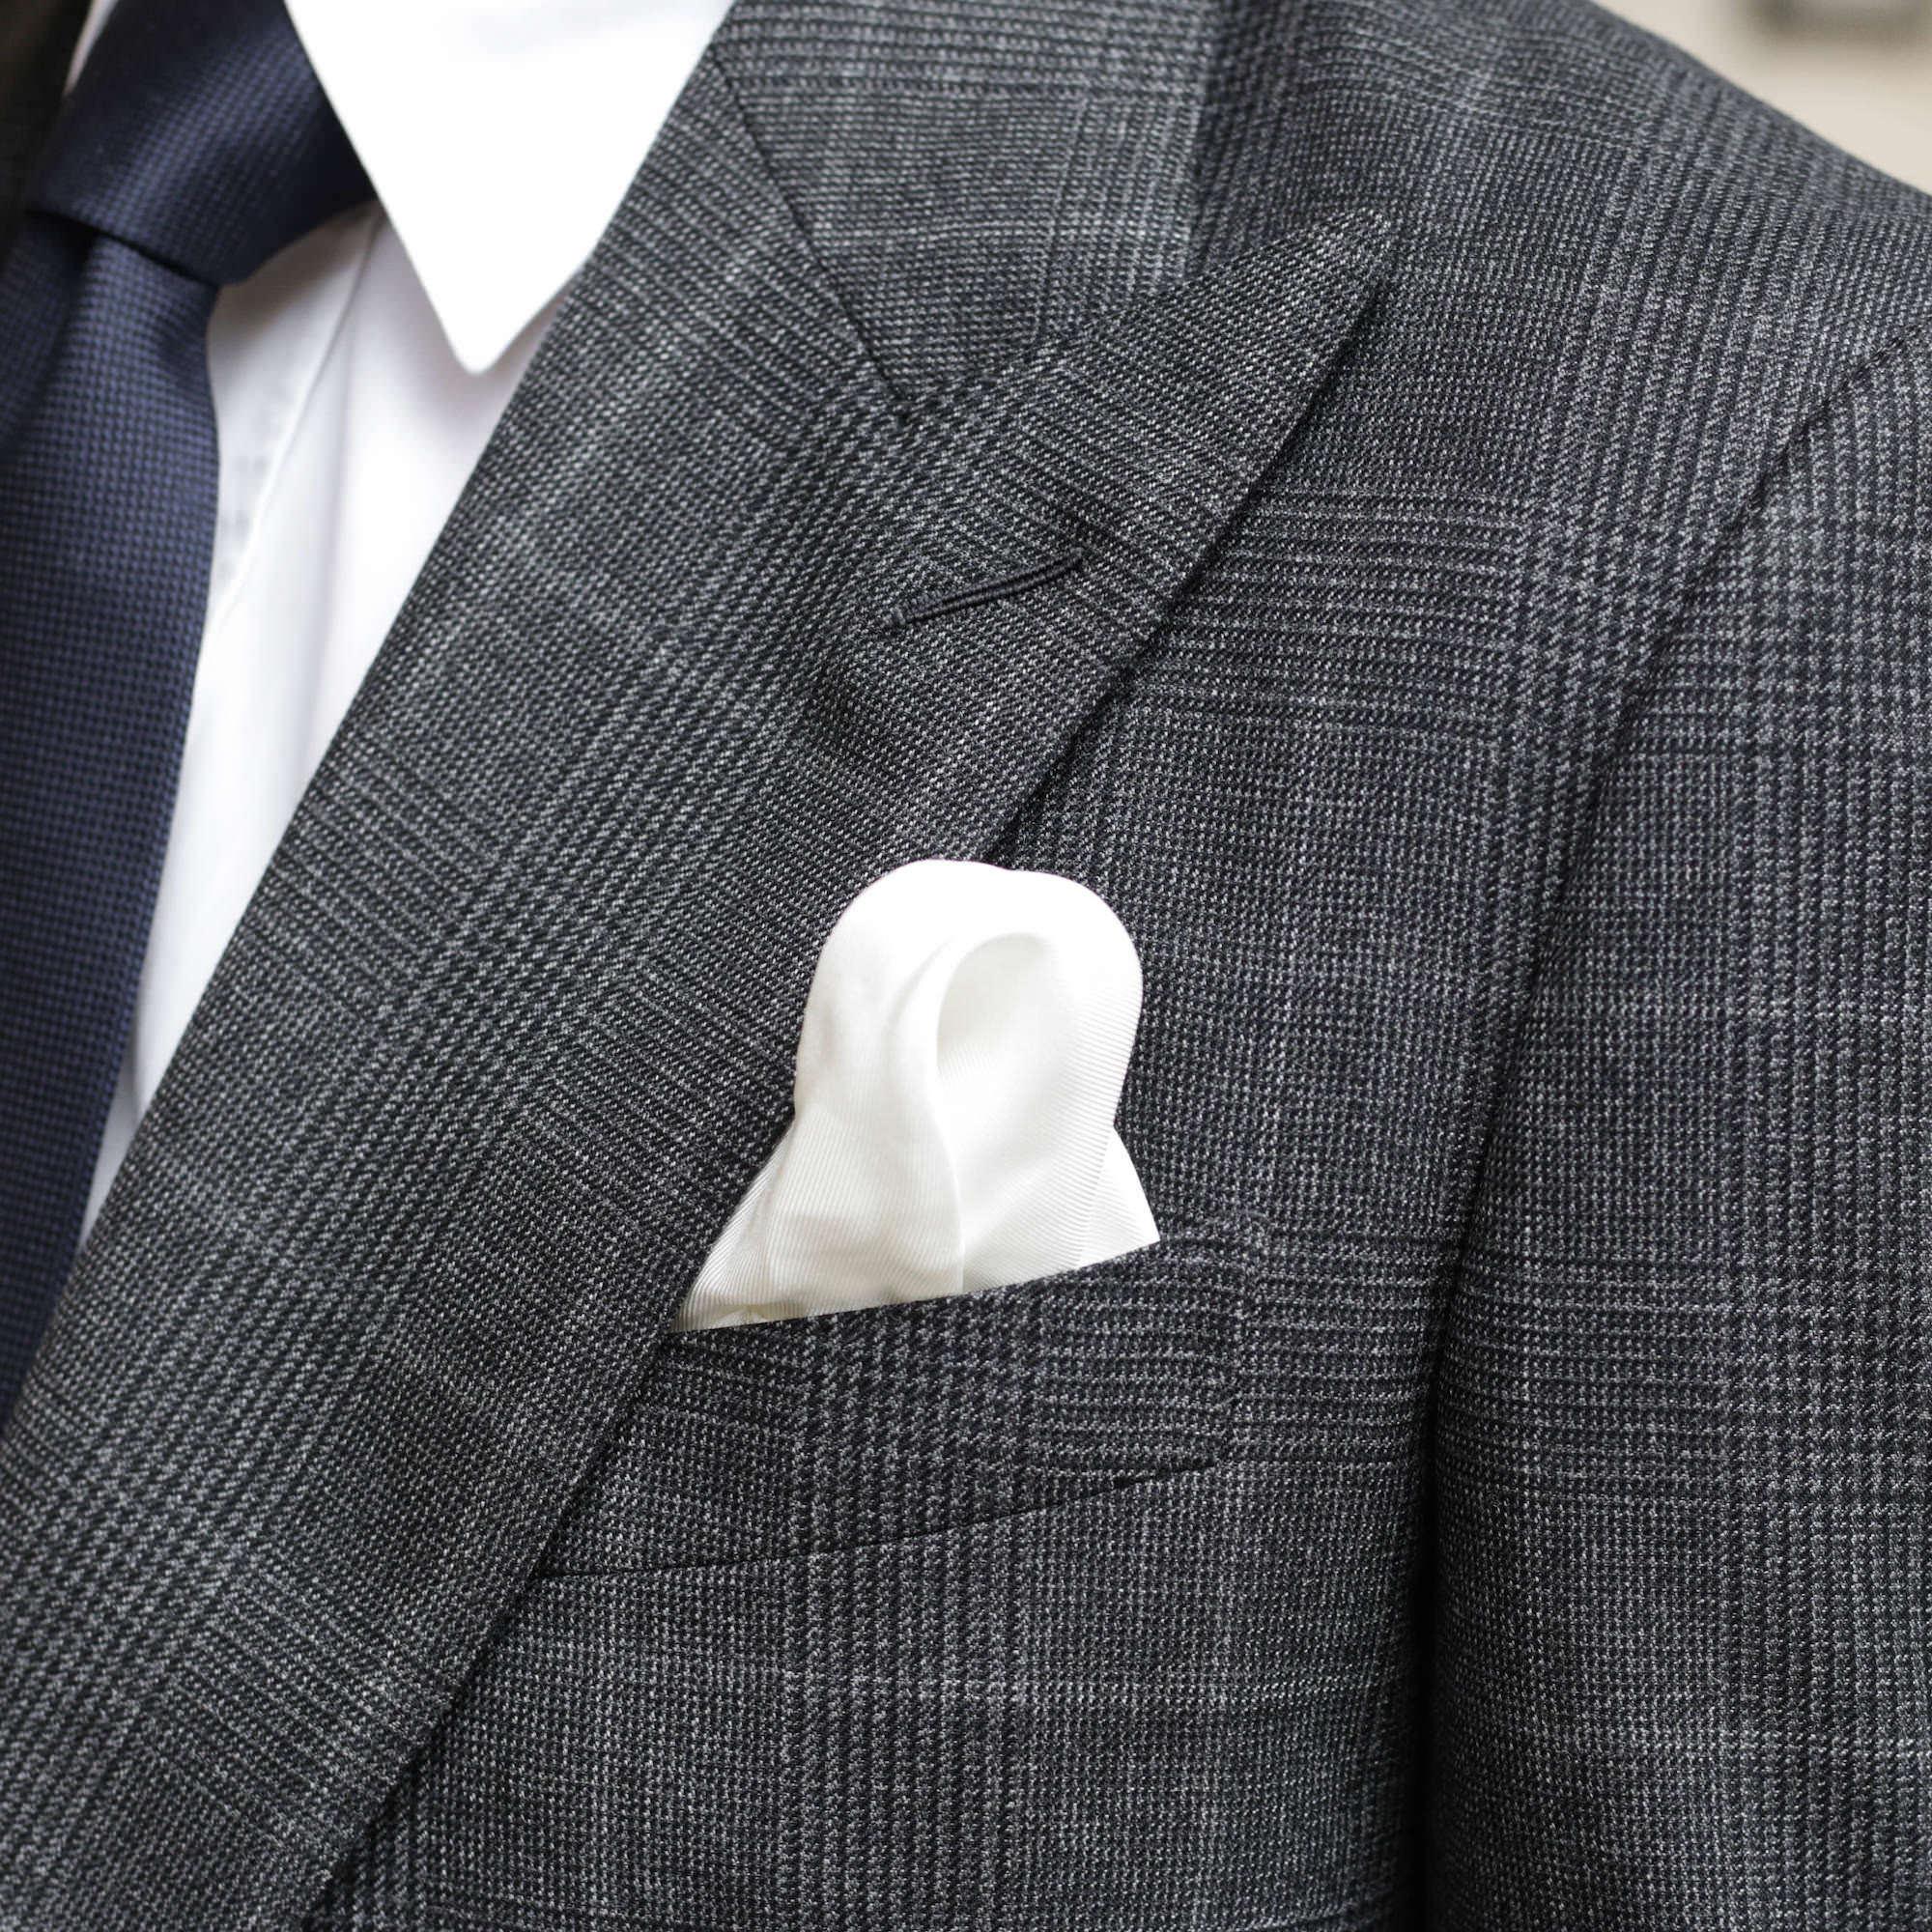 pochette de costume blanche sur tissu gris